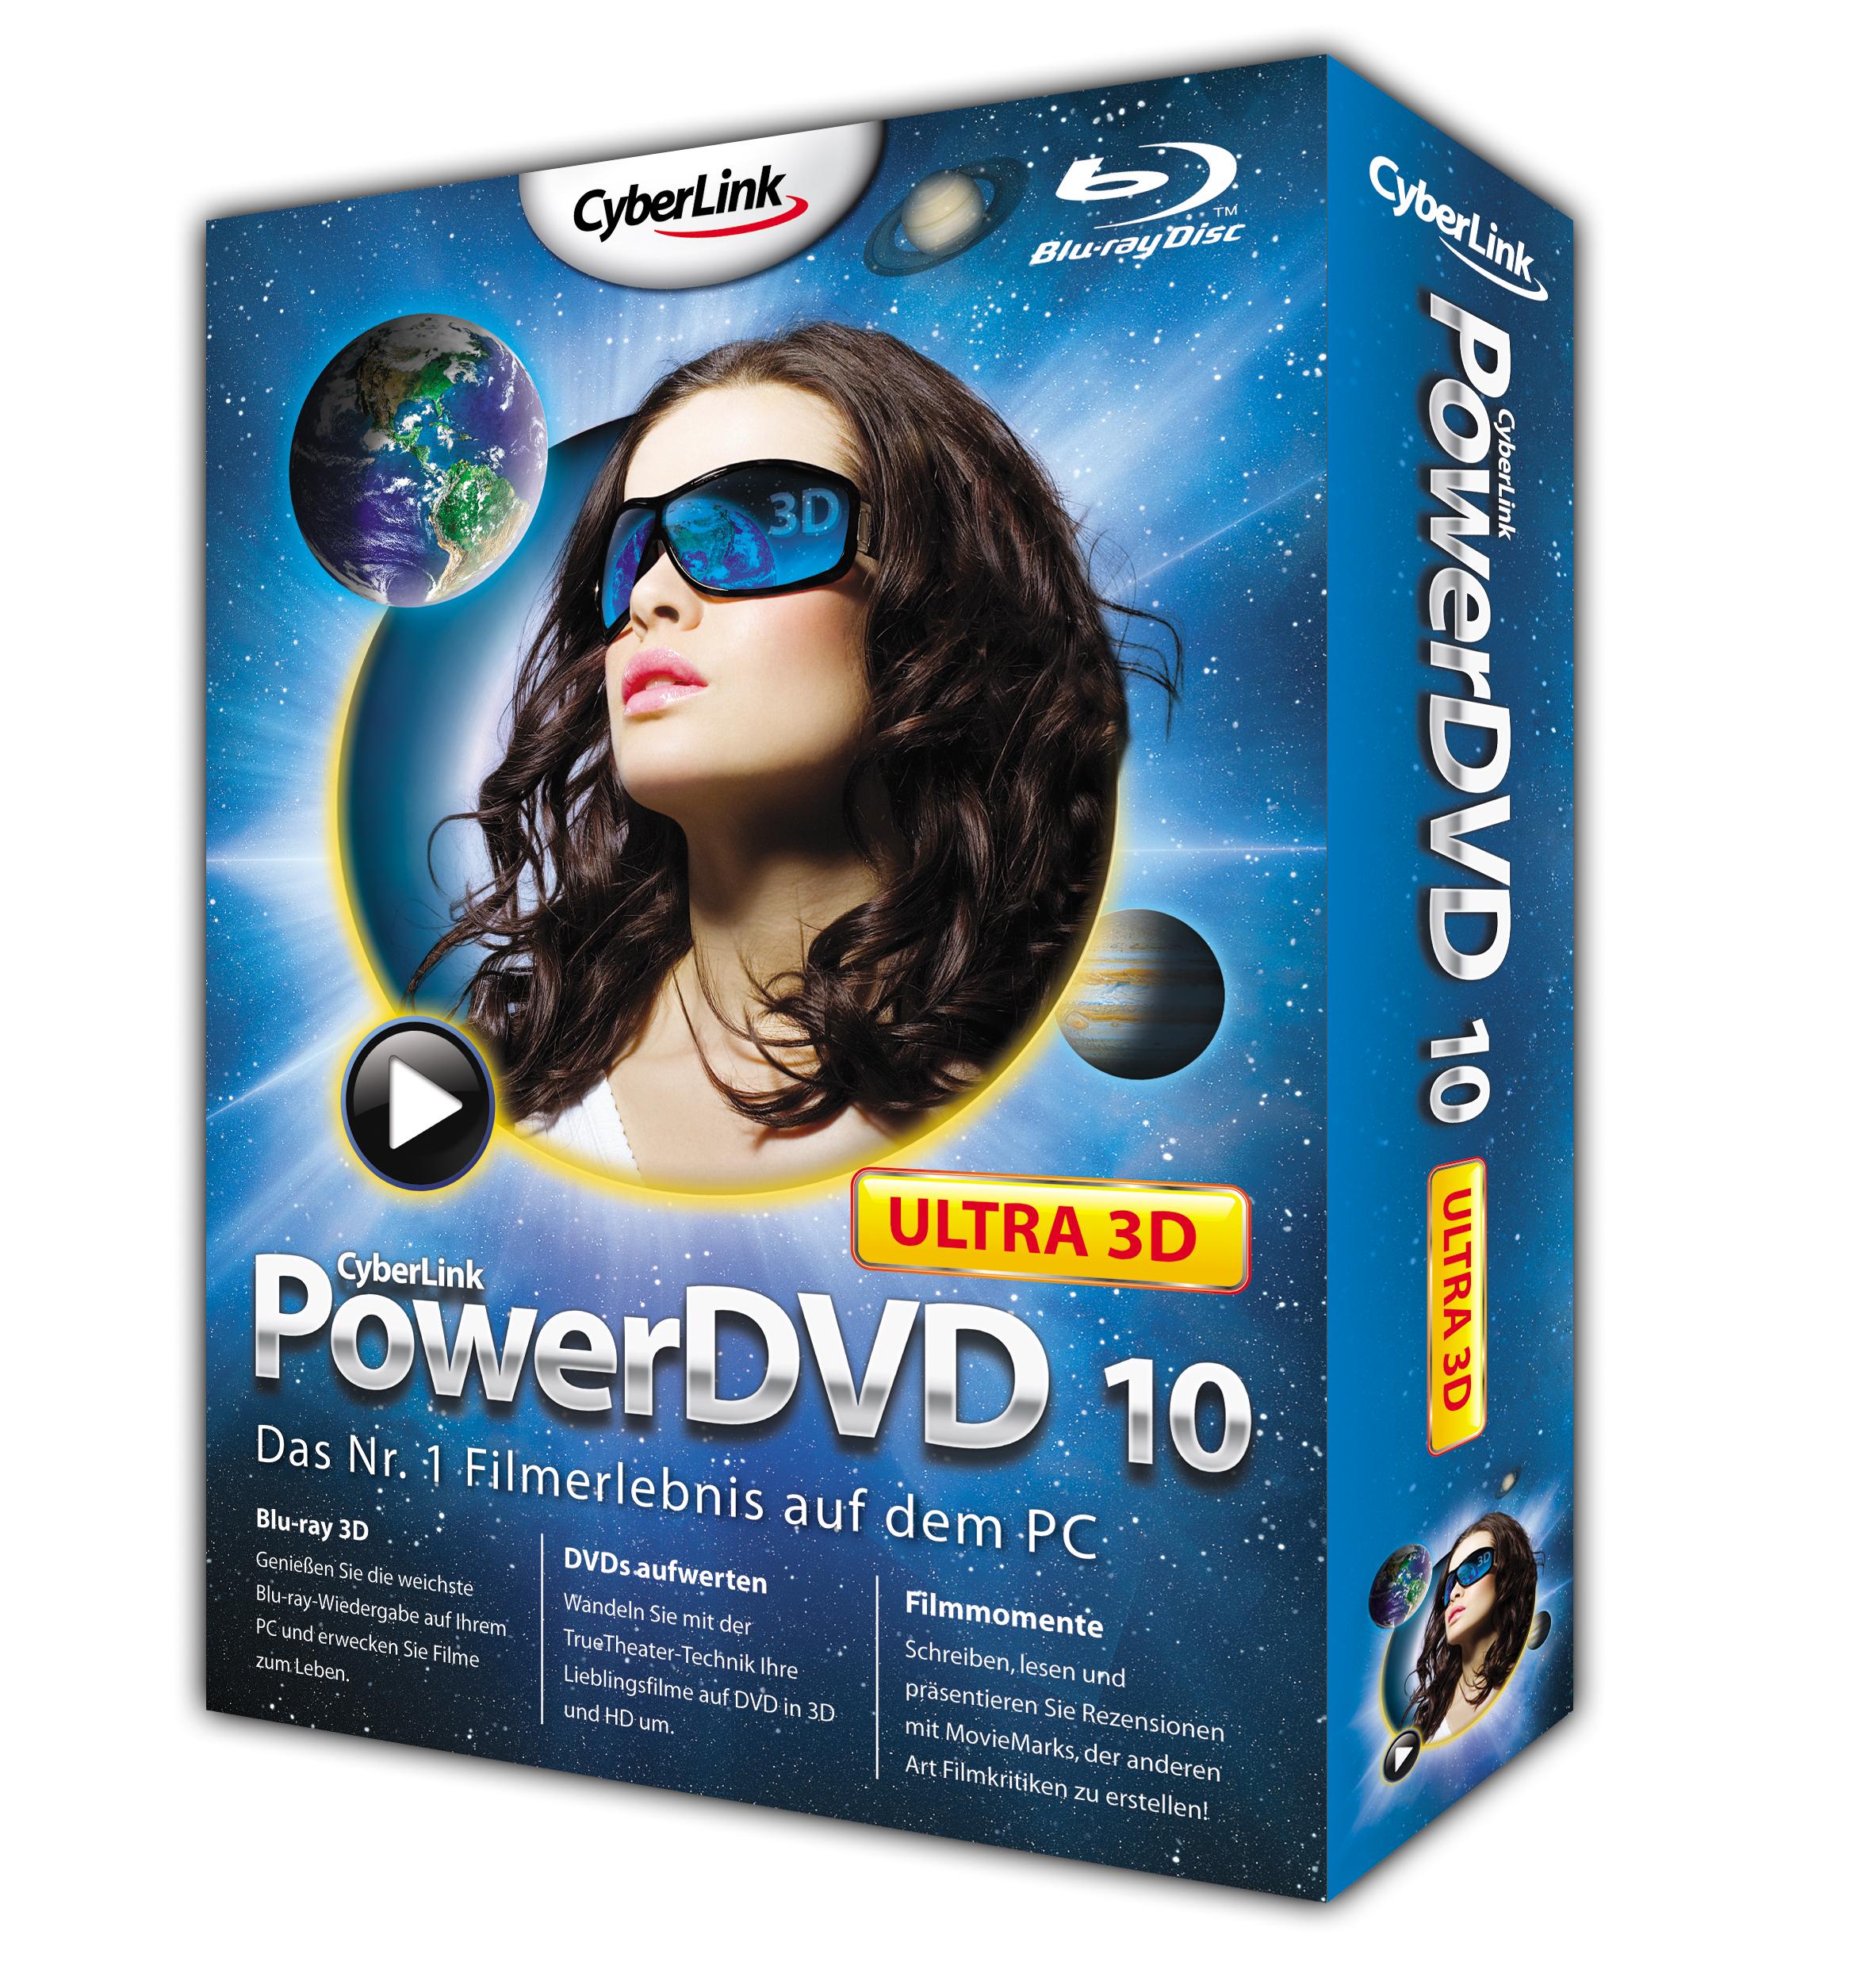 Cyberlink powerdvd 10 ultra v10.0.1516.51 retail regged